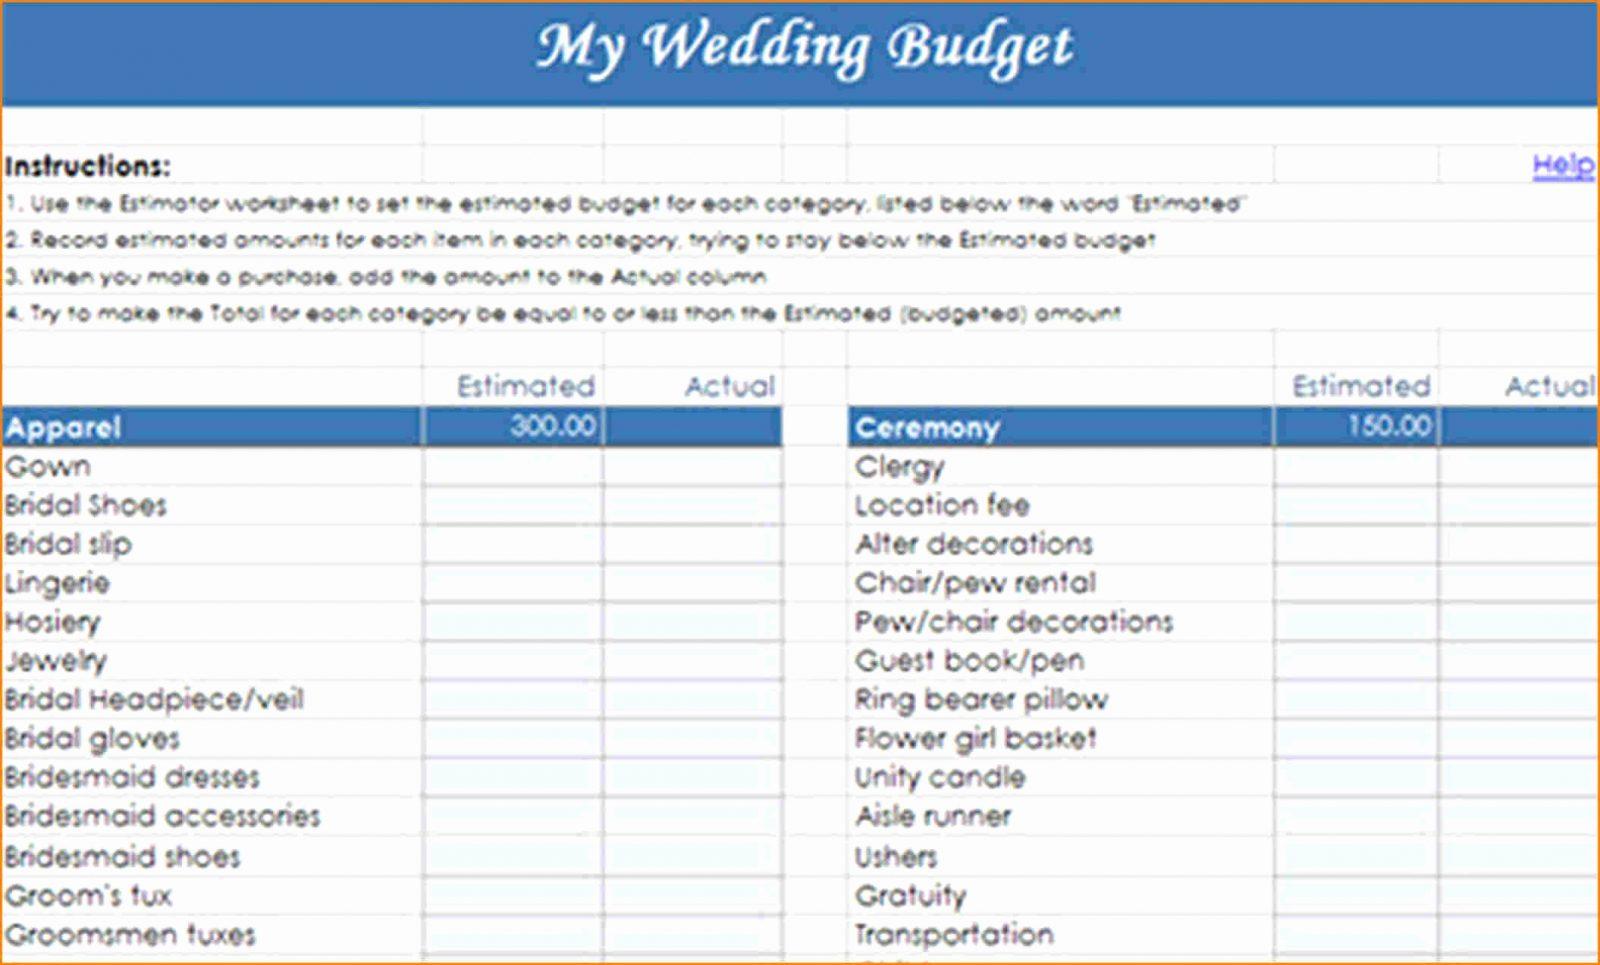 Detailed Wedding Budget Spreadsheet Spreadshee